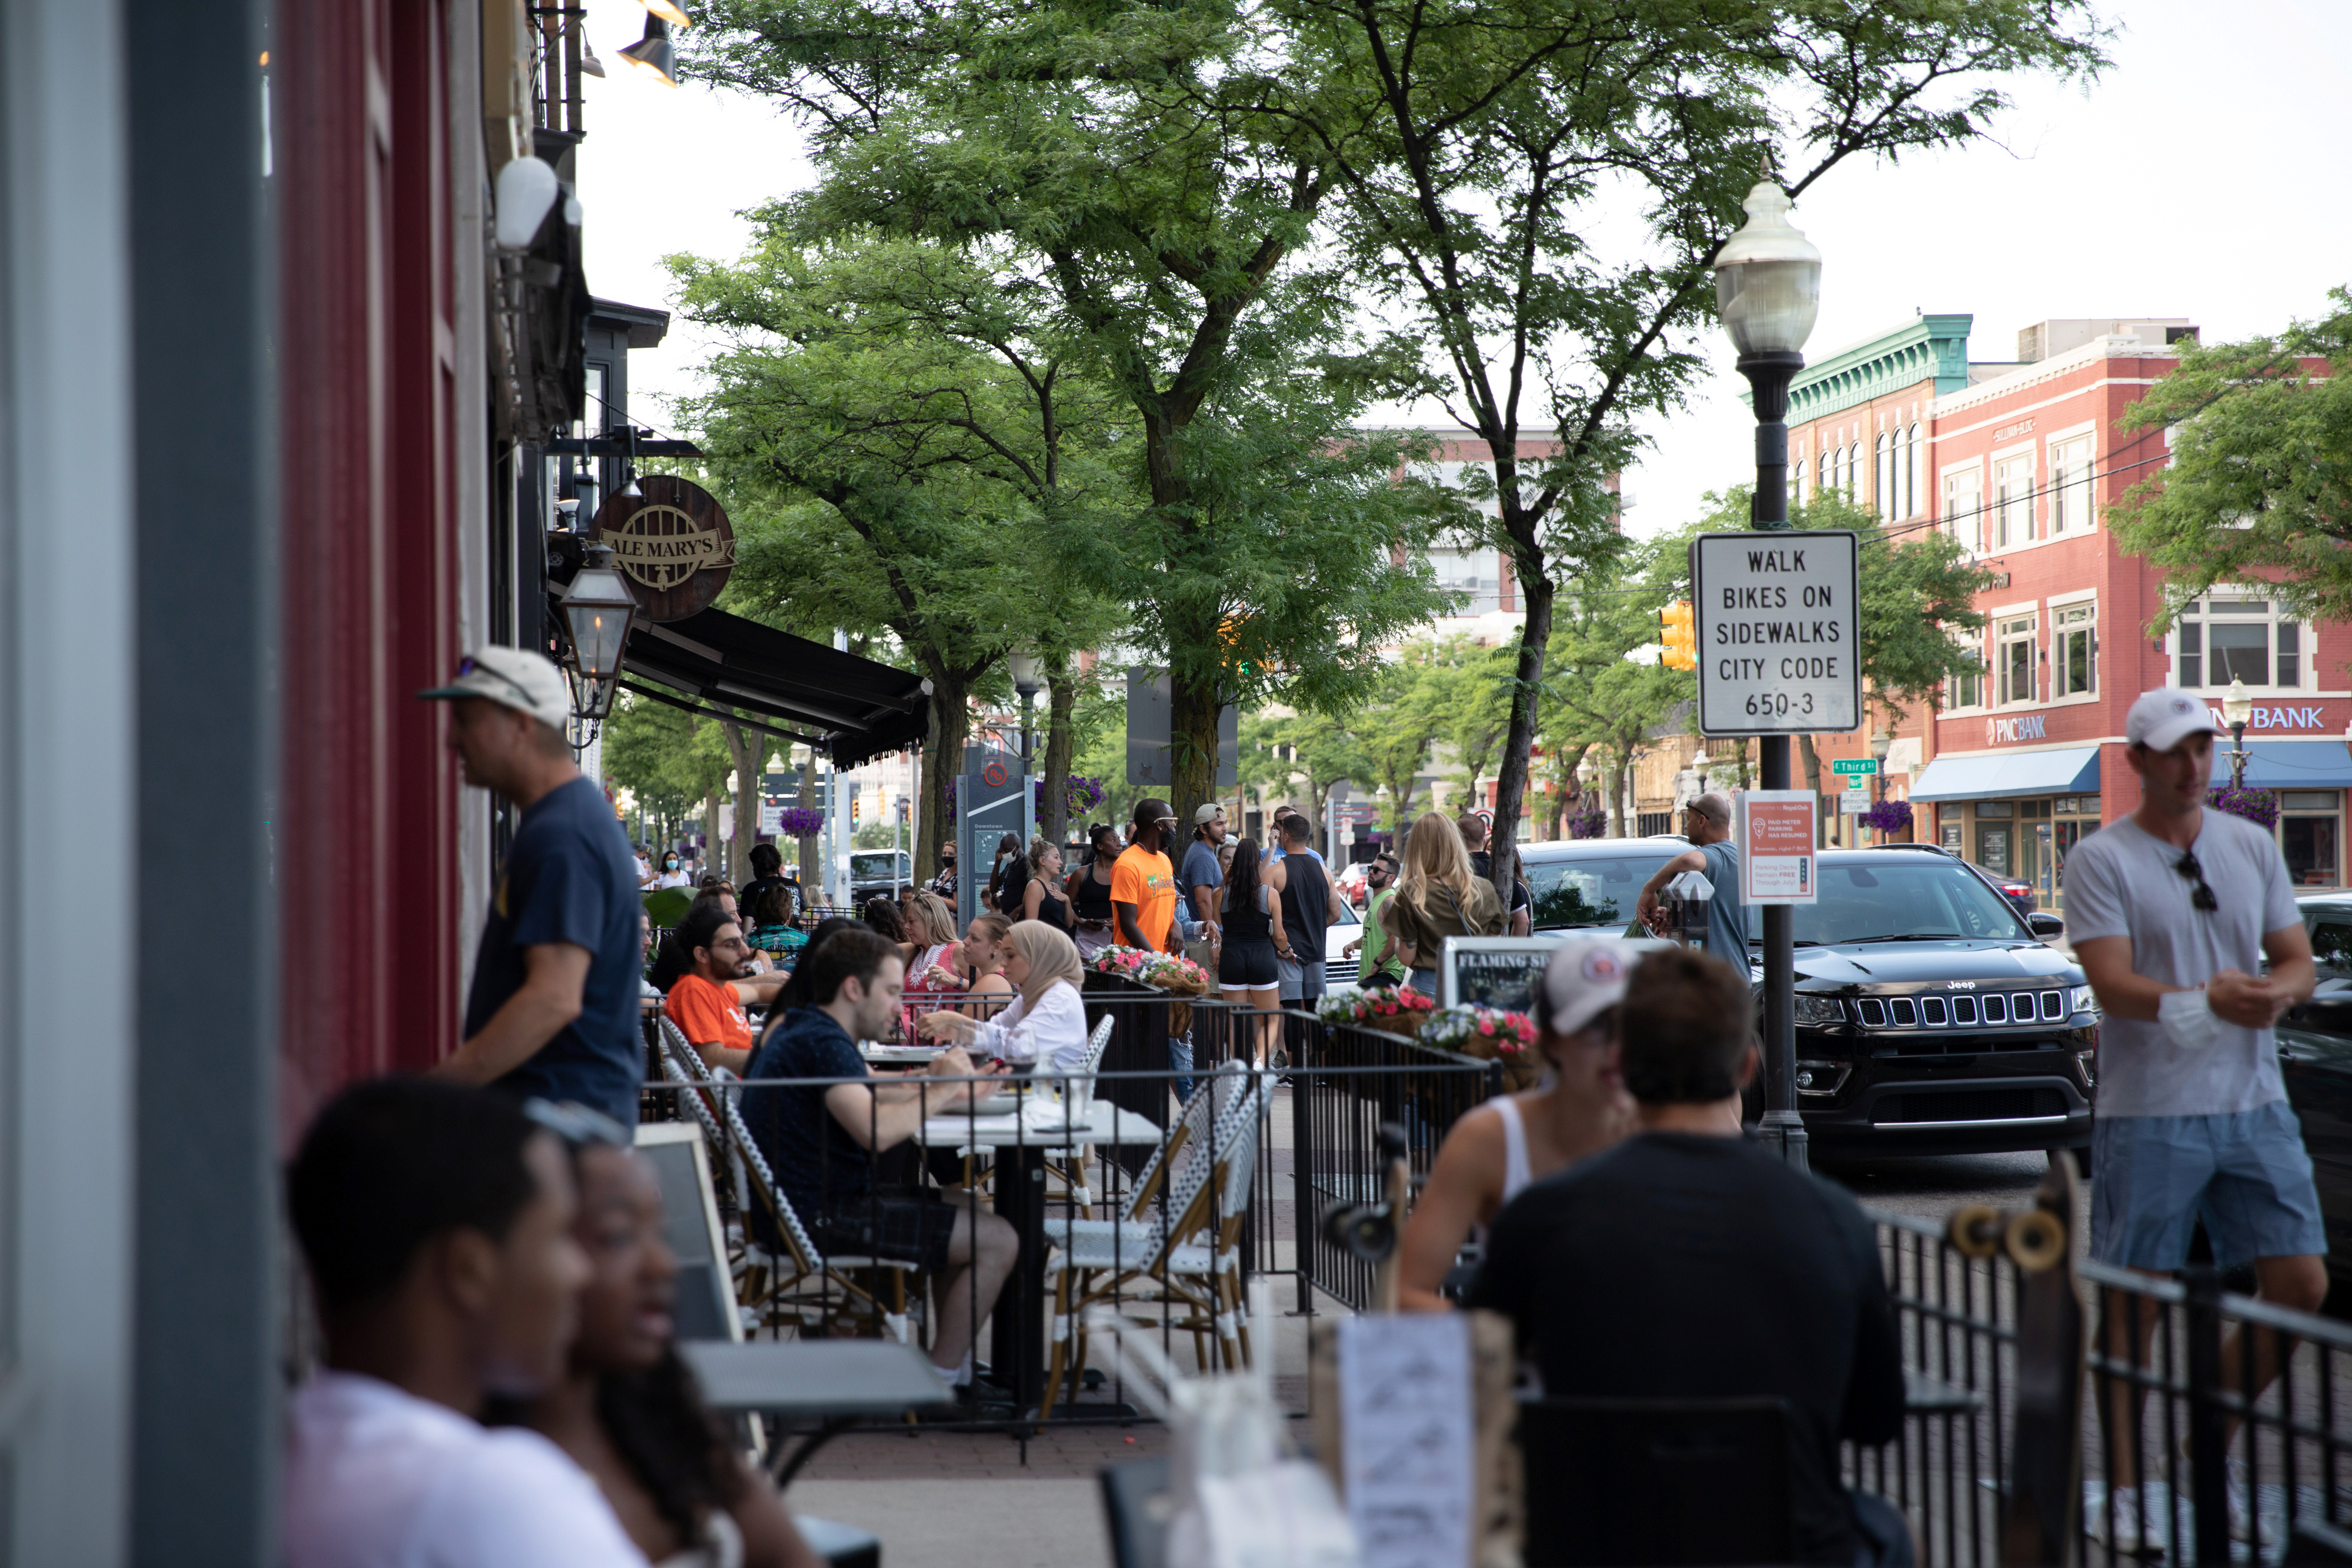 People crowd restaurants and sidewalks amid the coronavirus disease (COVID-19) outbreak in Royal Oak, Michigan, US, on June 30, 2020. Photo:  Reuters